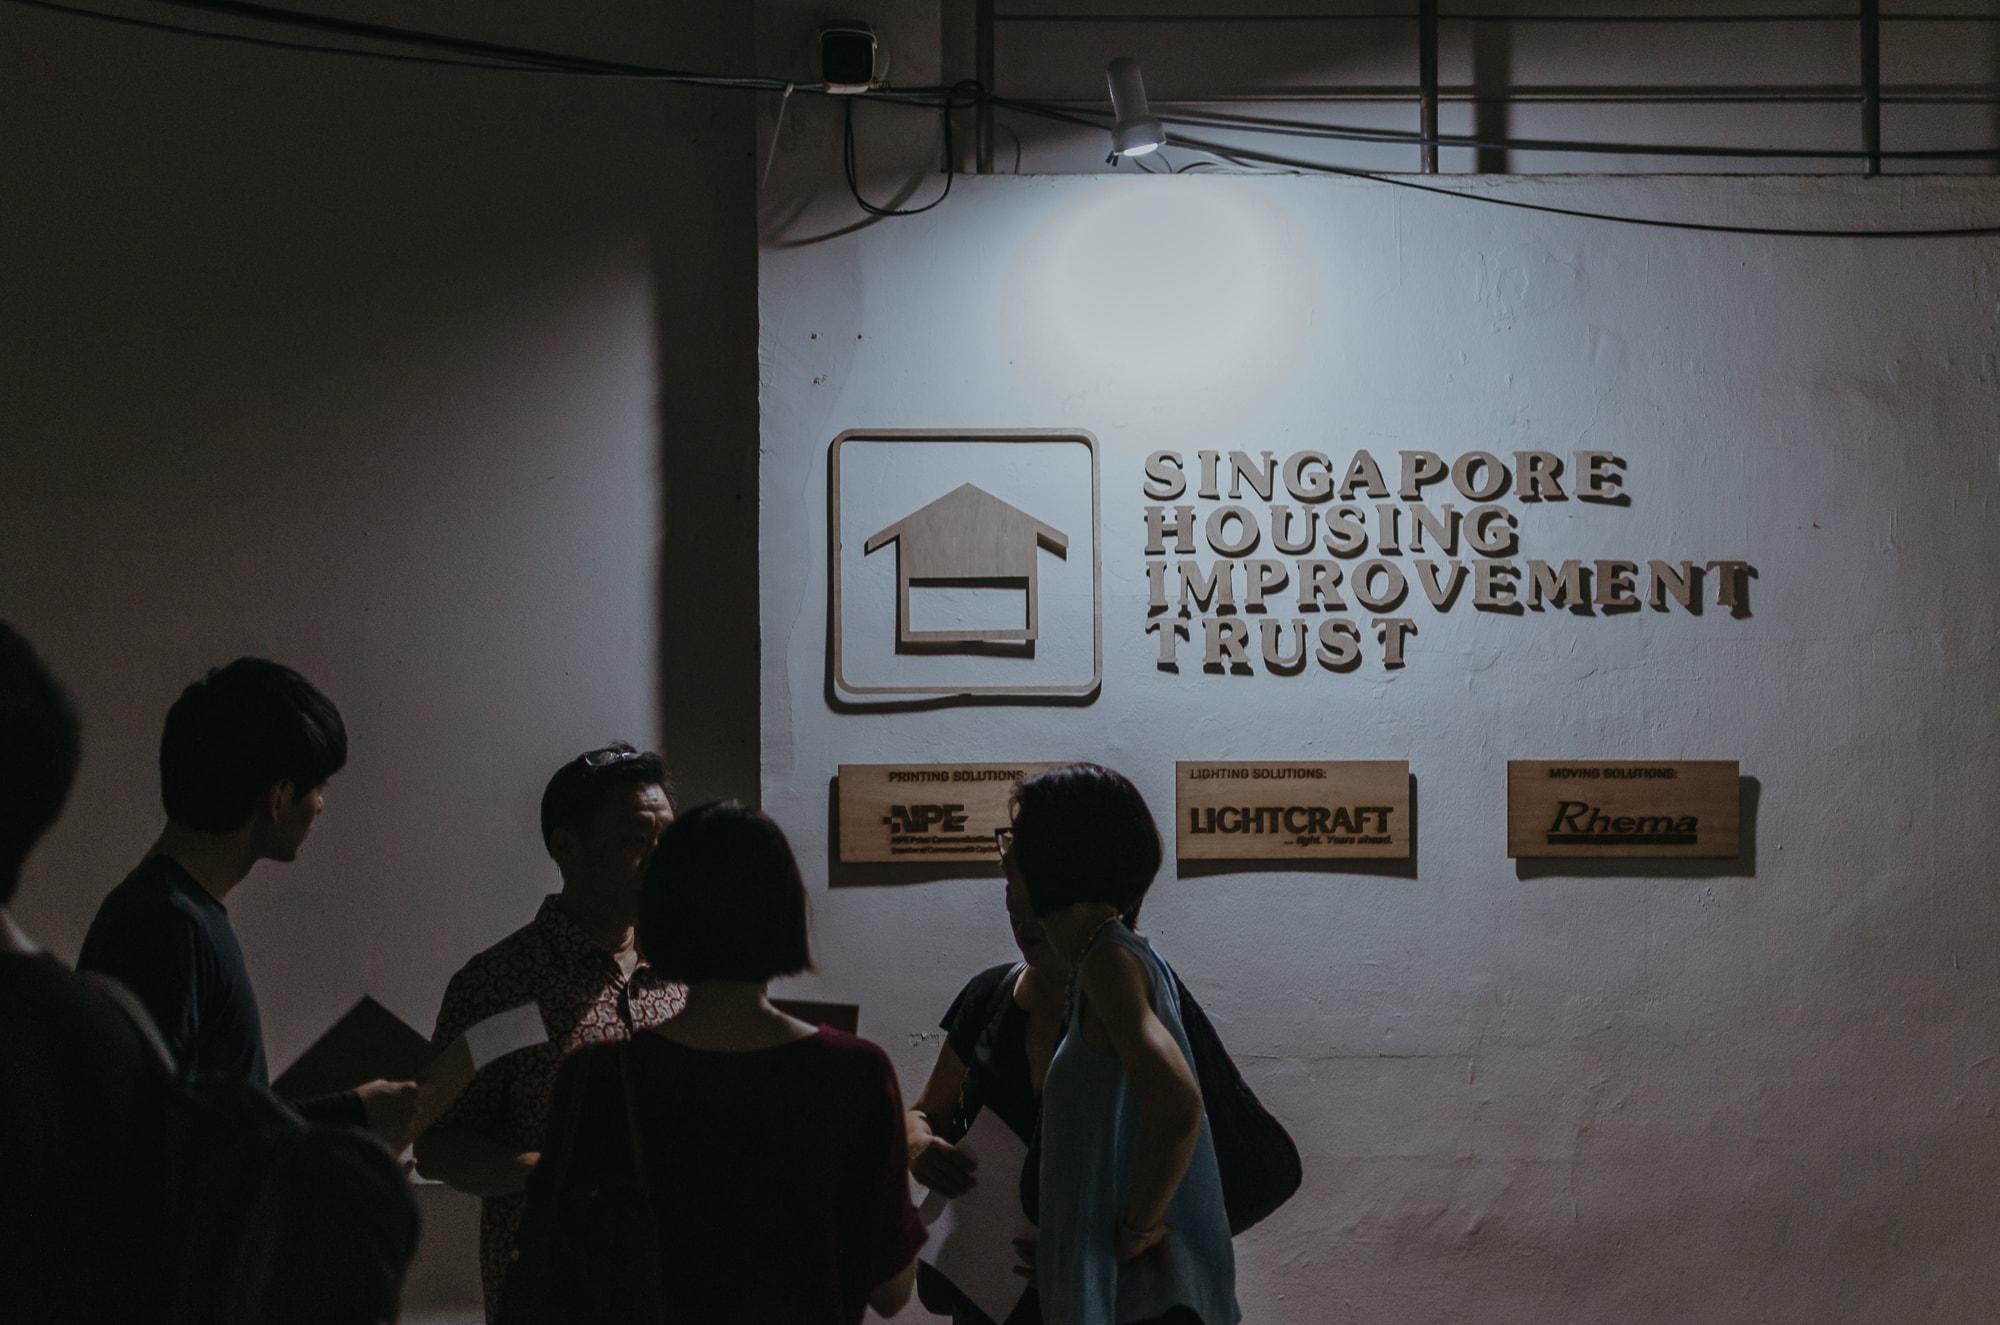 Documentation by Yap Yen and Charmaine Chua